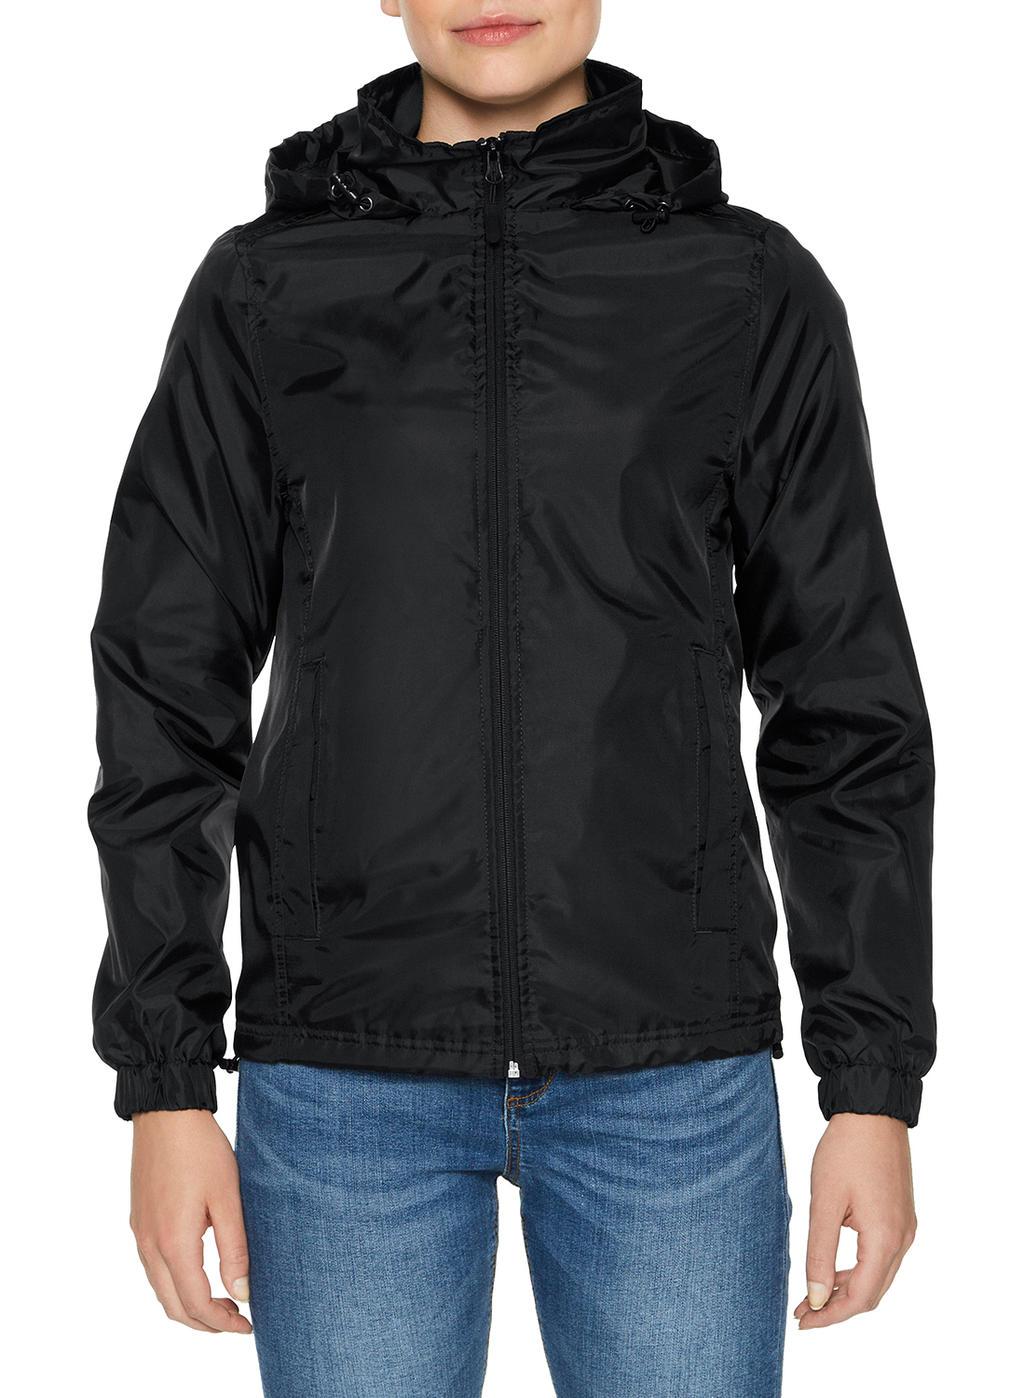 Hammer™ Ladies' Windwear Jacket